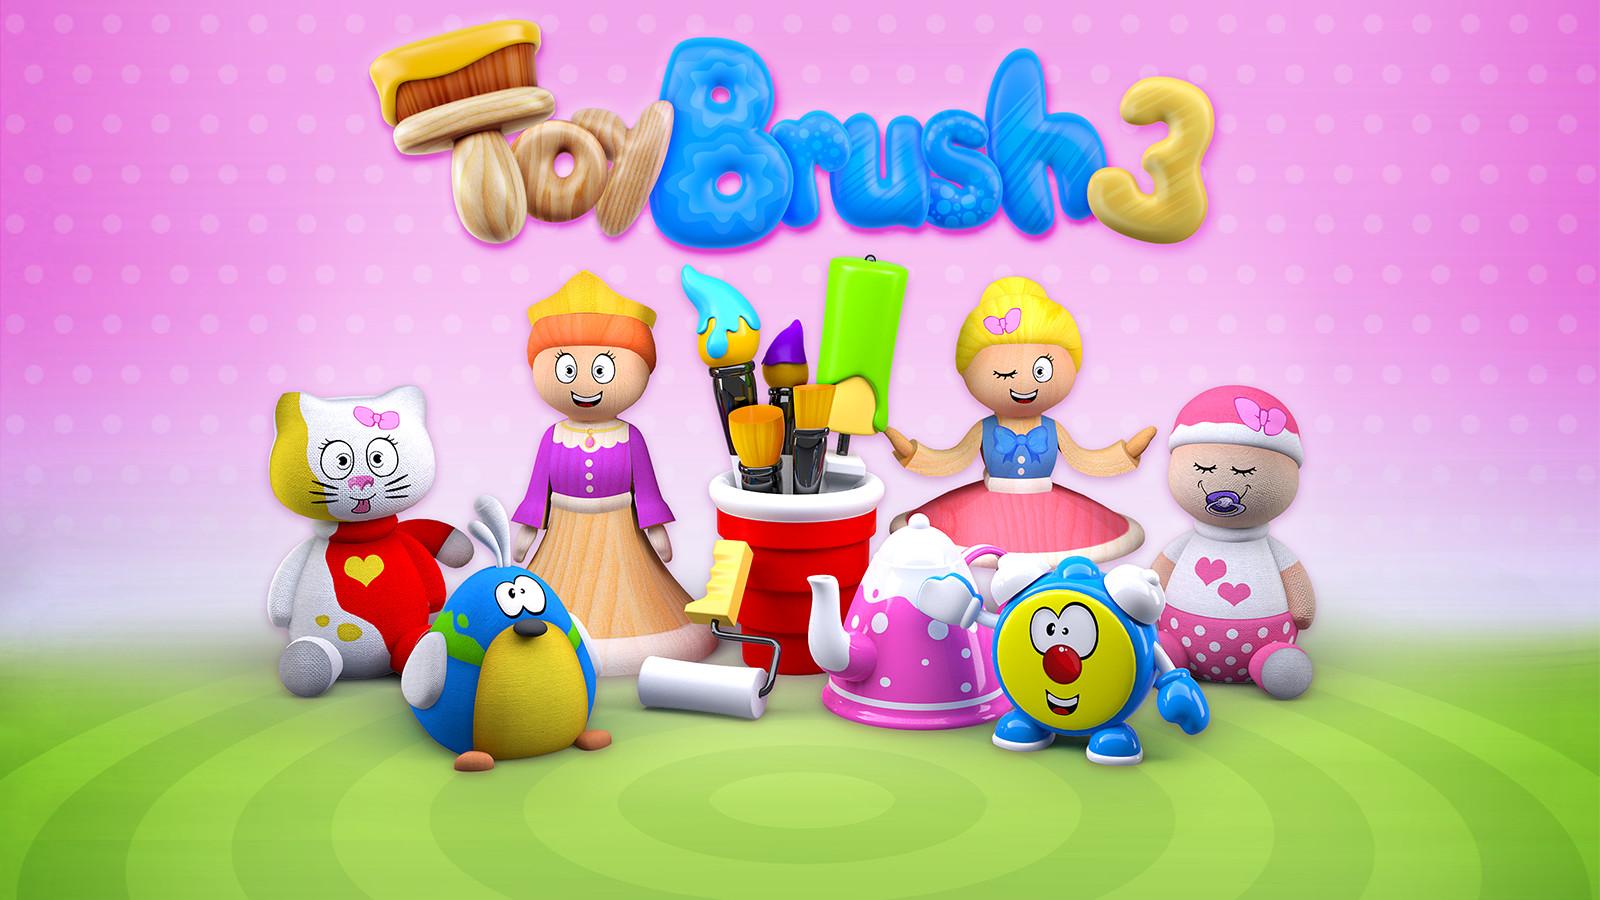 Play Video - ToyBrush 3D